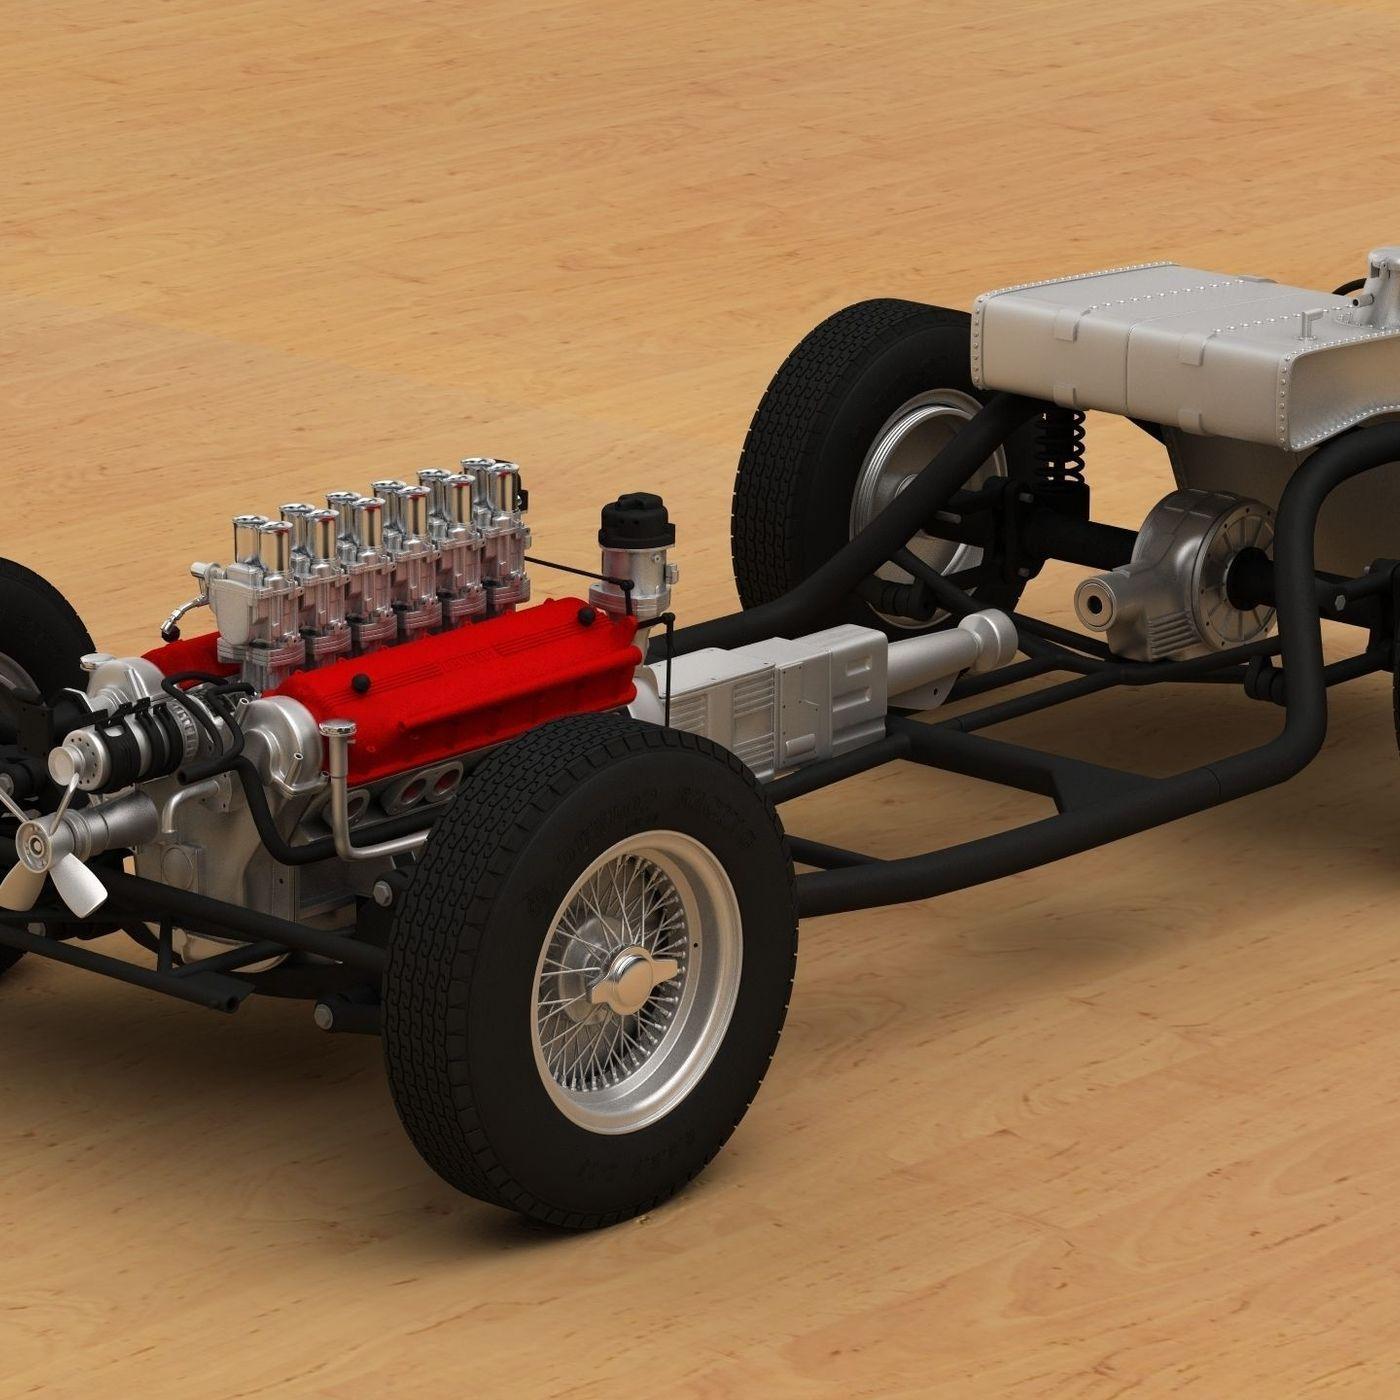 3D Printed Ferrari 250 Testa Rossa